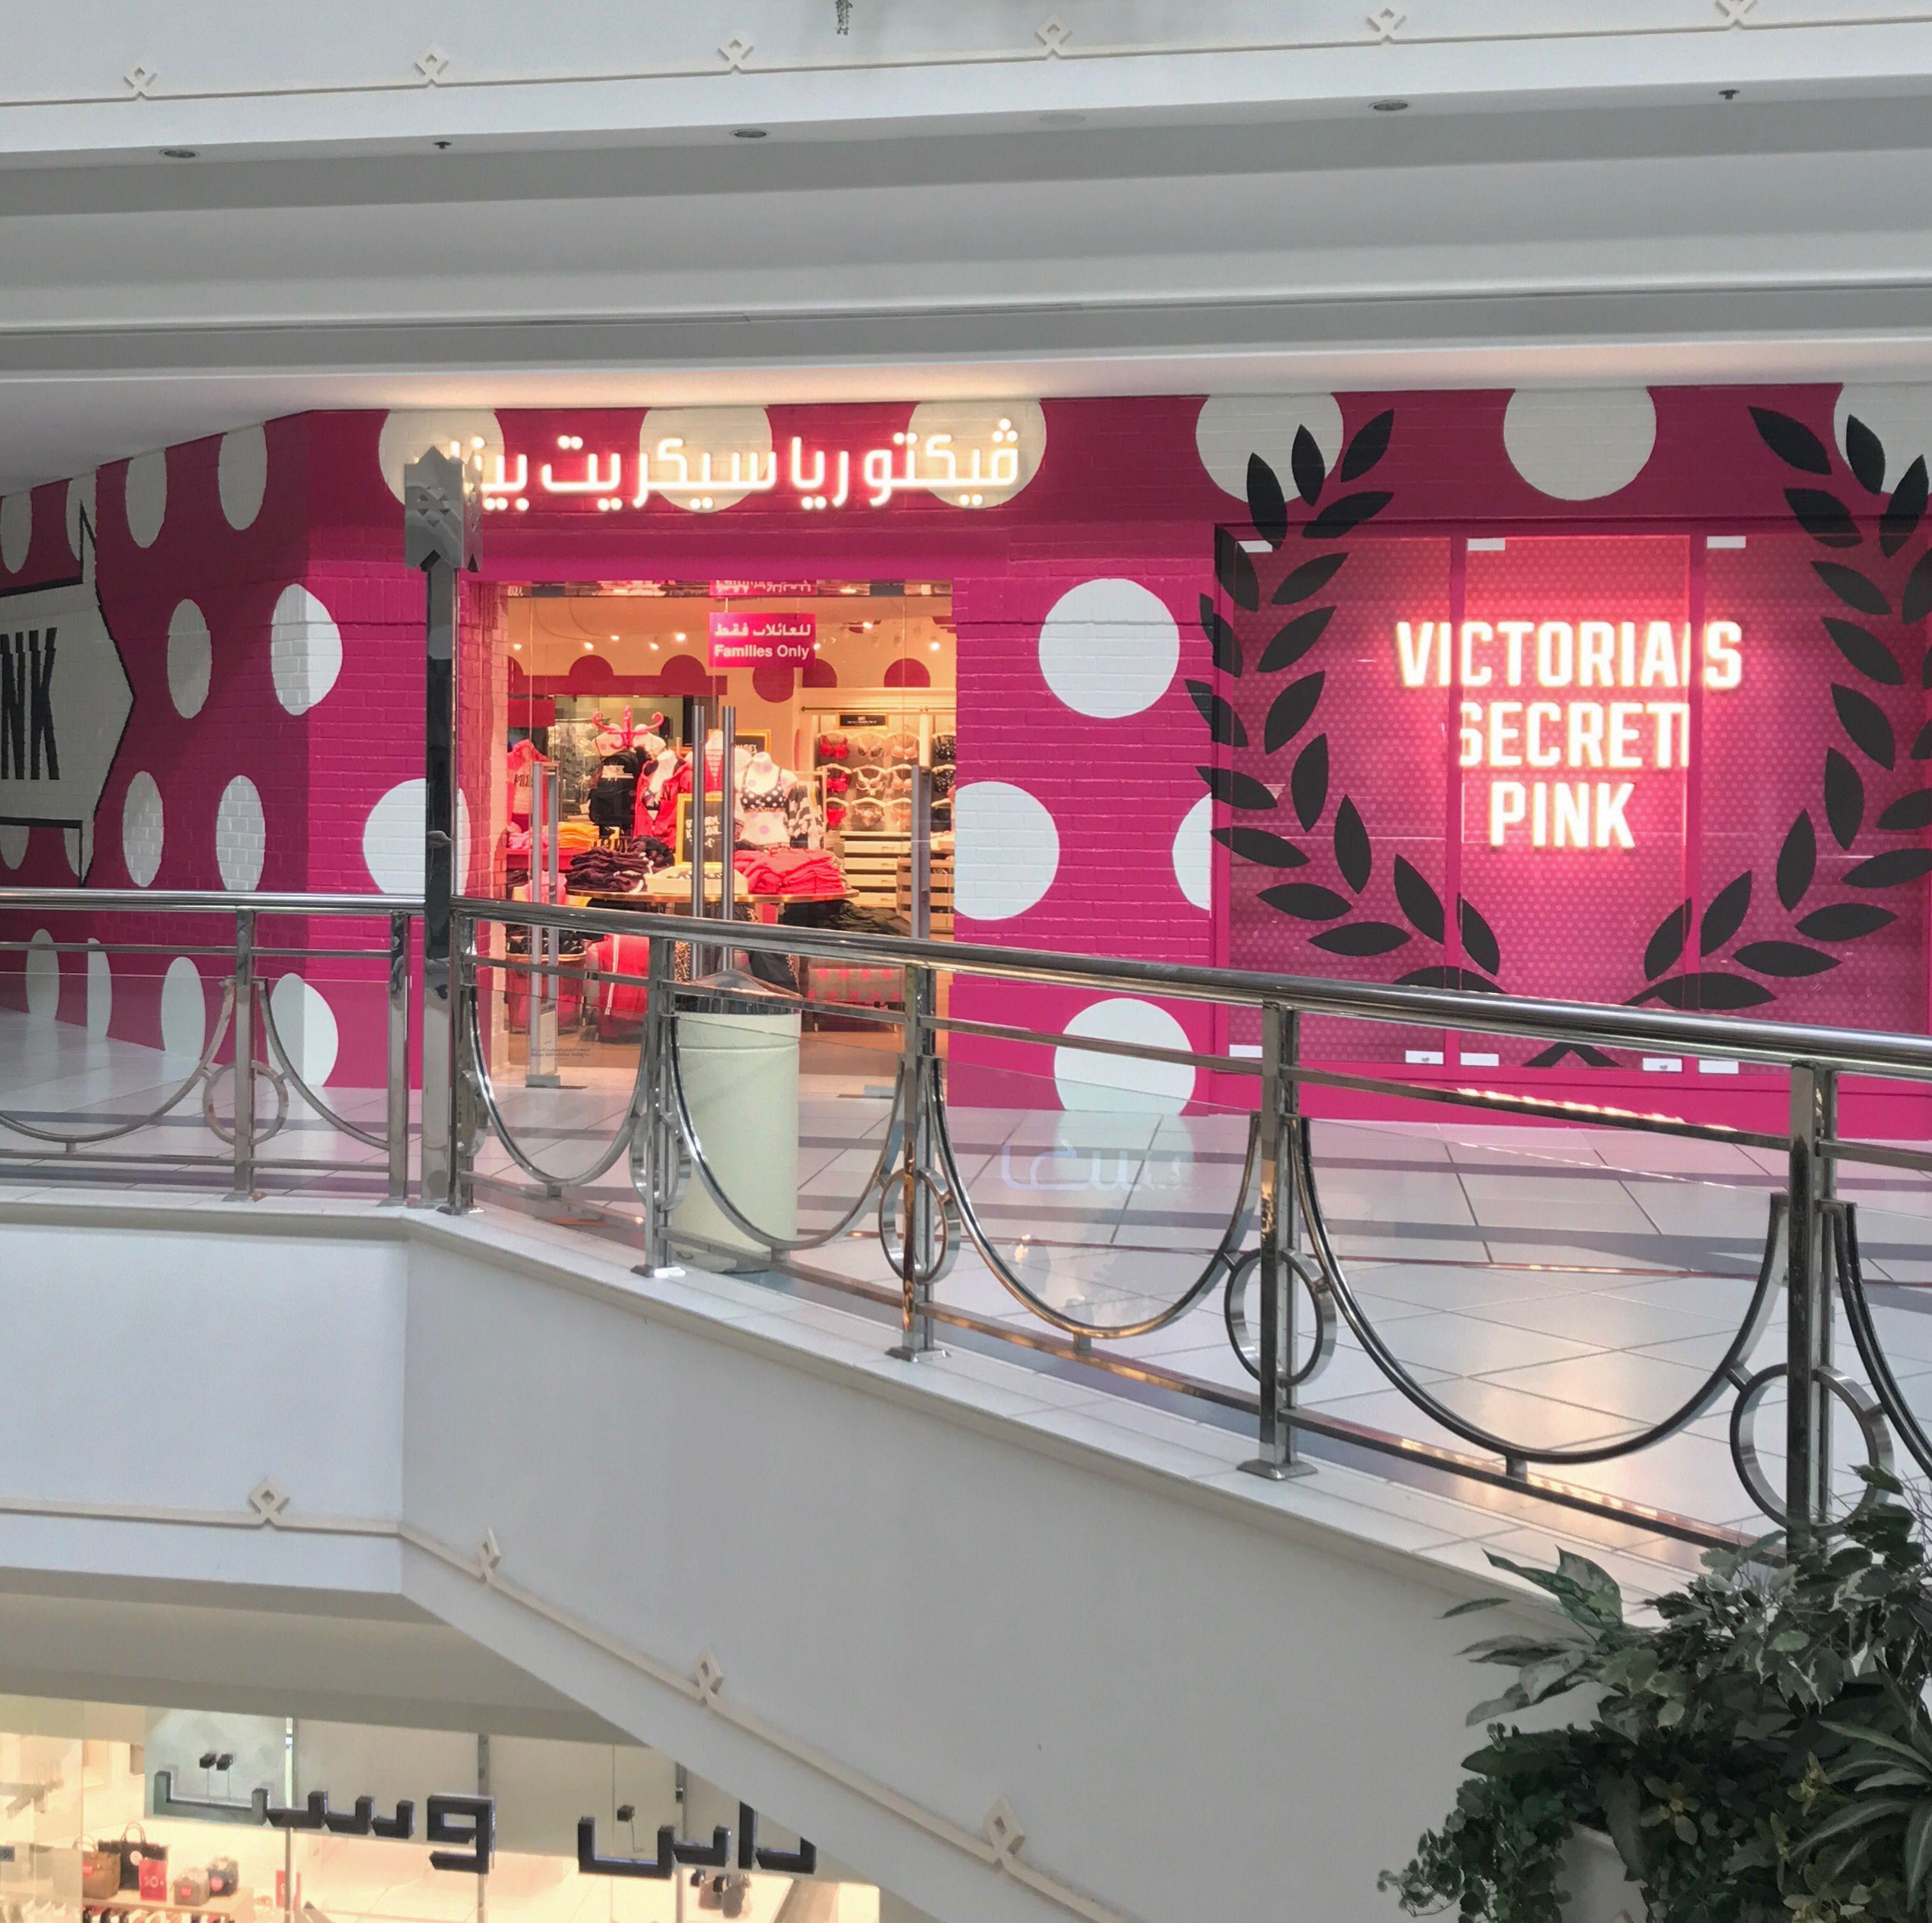 فيكتوريا سيكريت بينك Victoria S Srcret Pink Neon Signs Secret Secret Pink